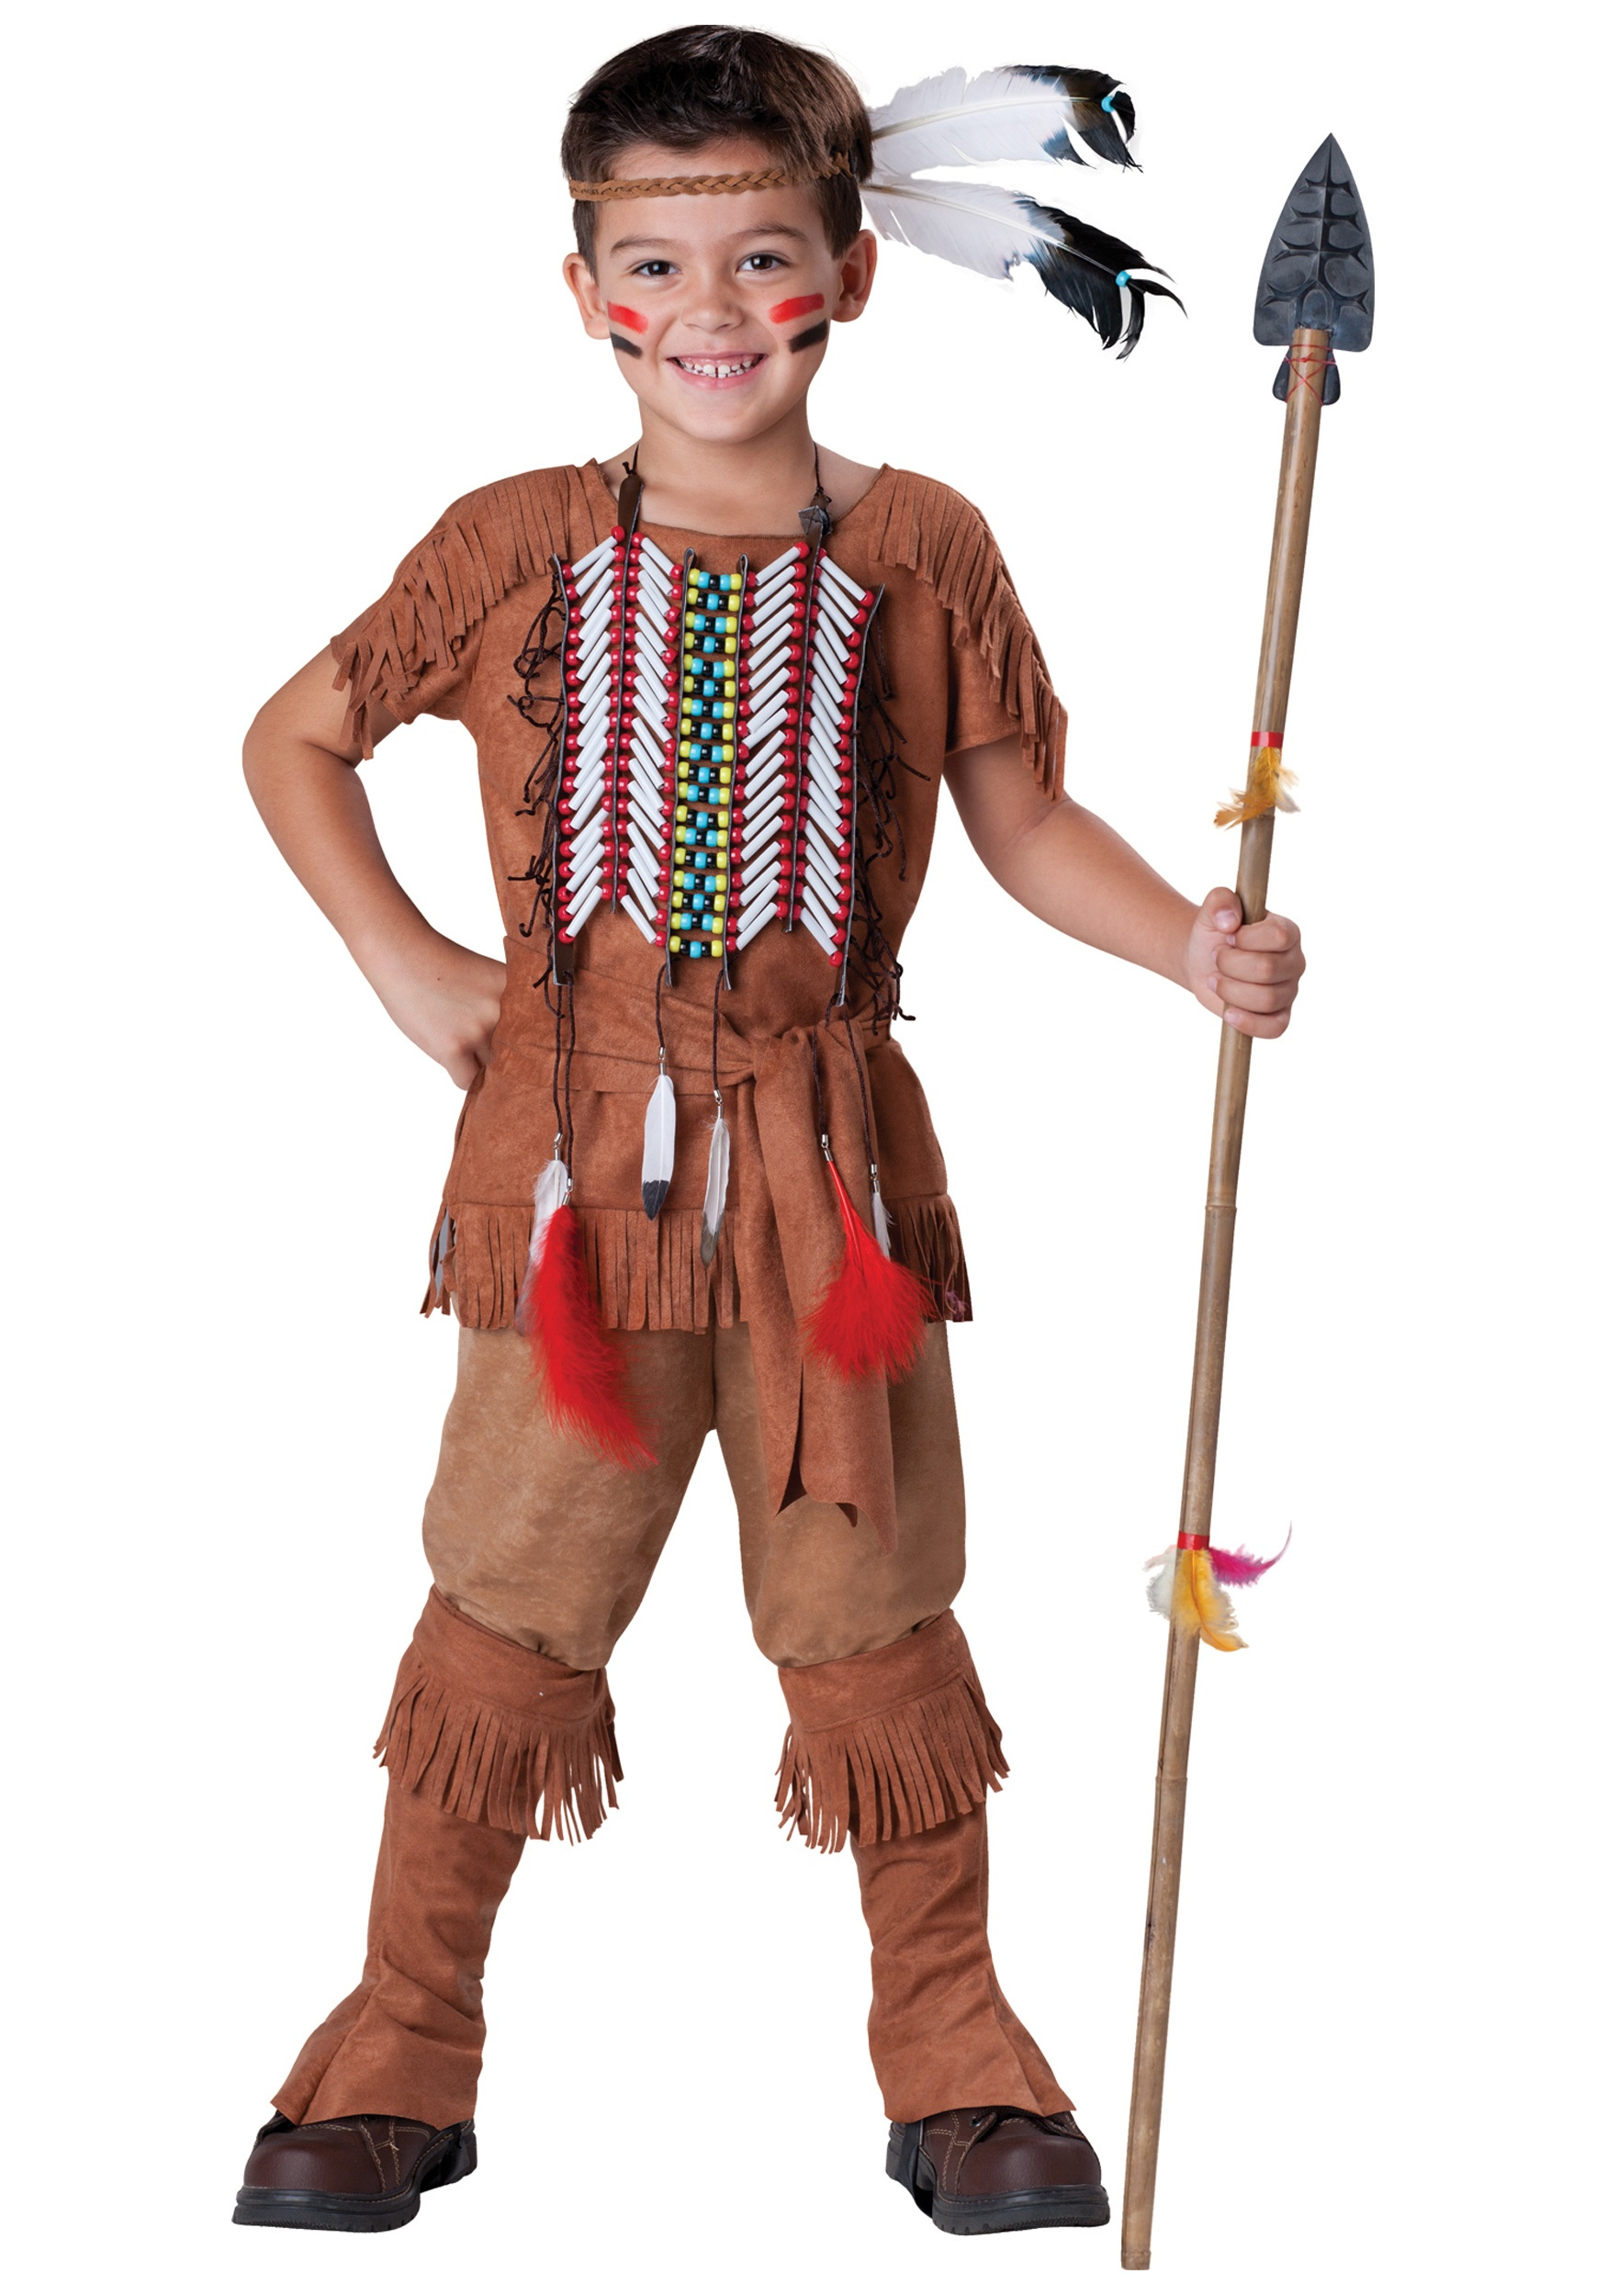 Индеец костюм для мальчика своими руками фото быстро